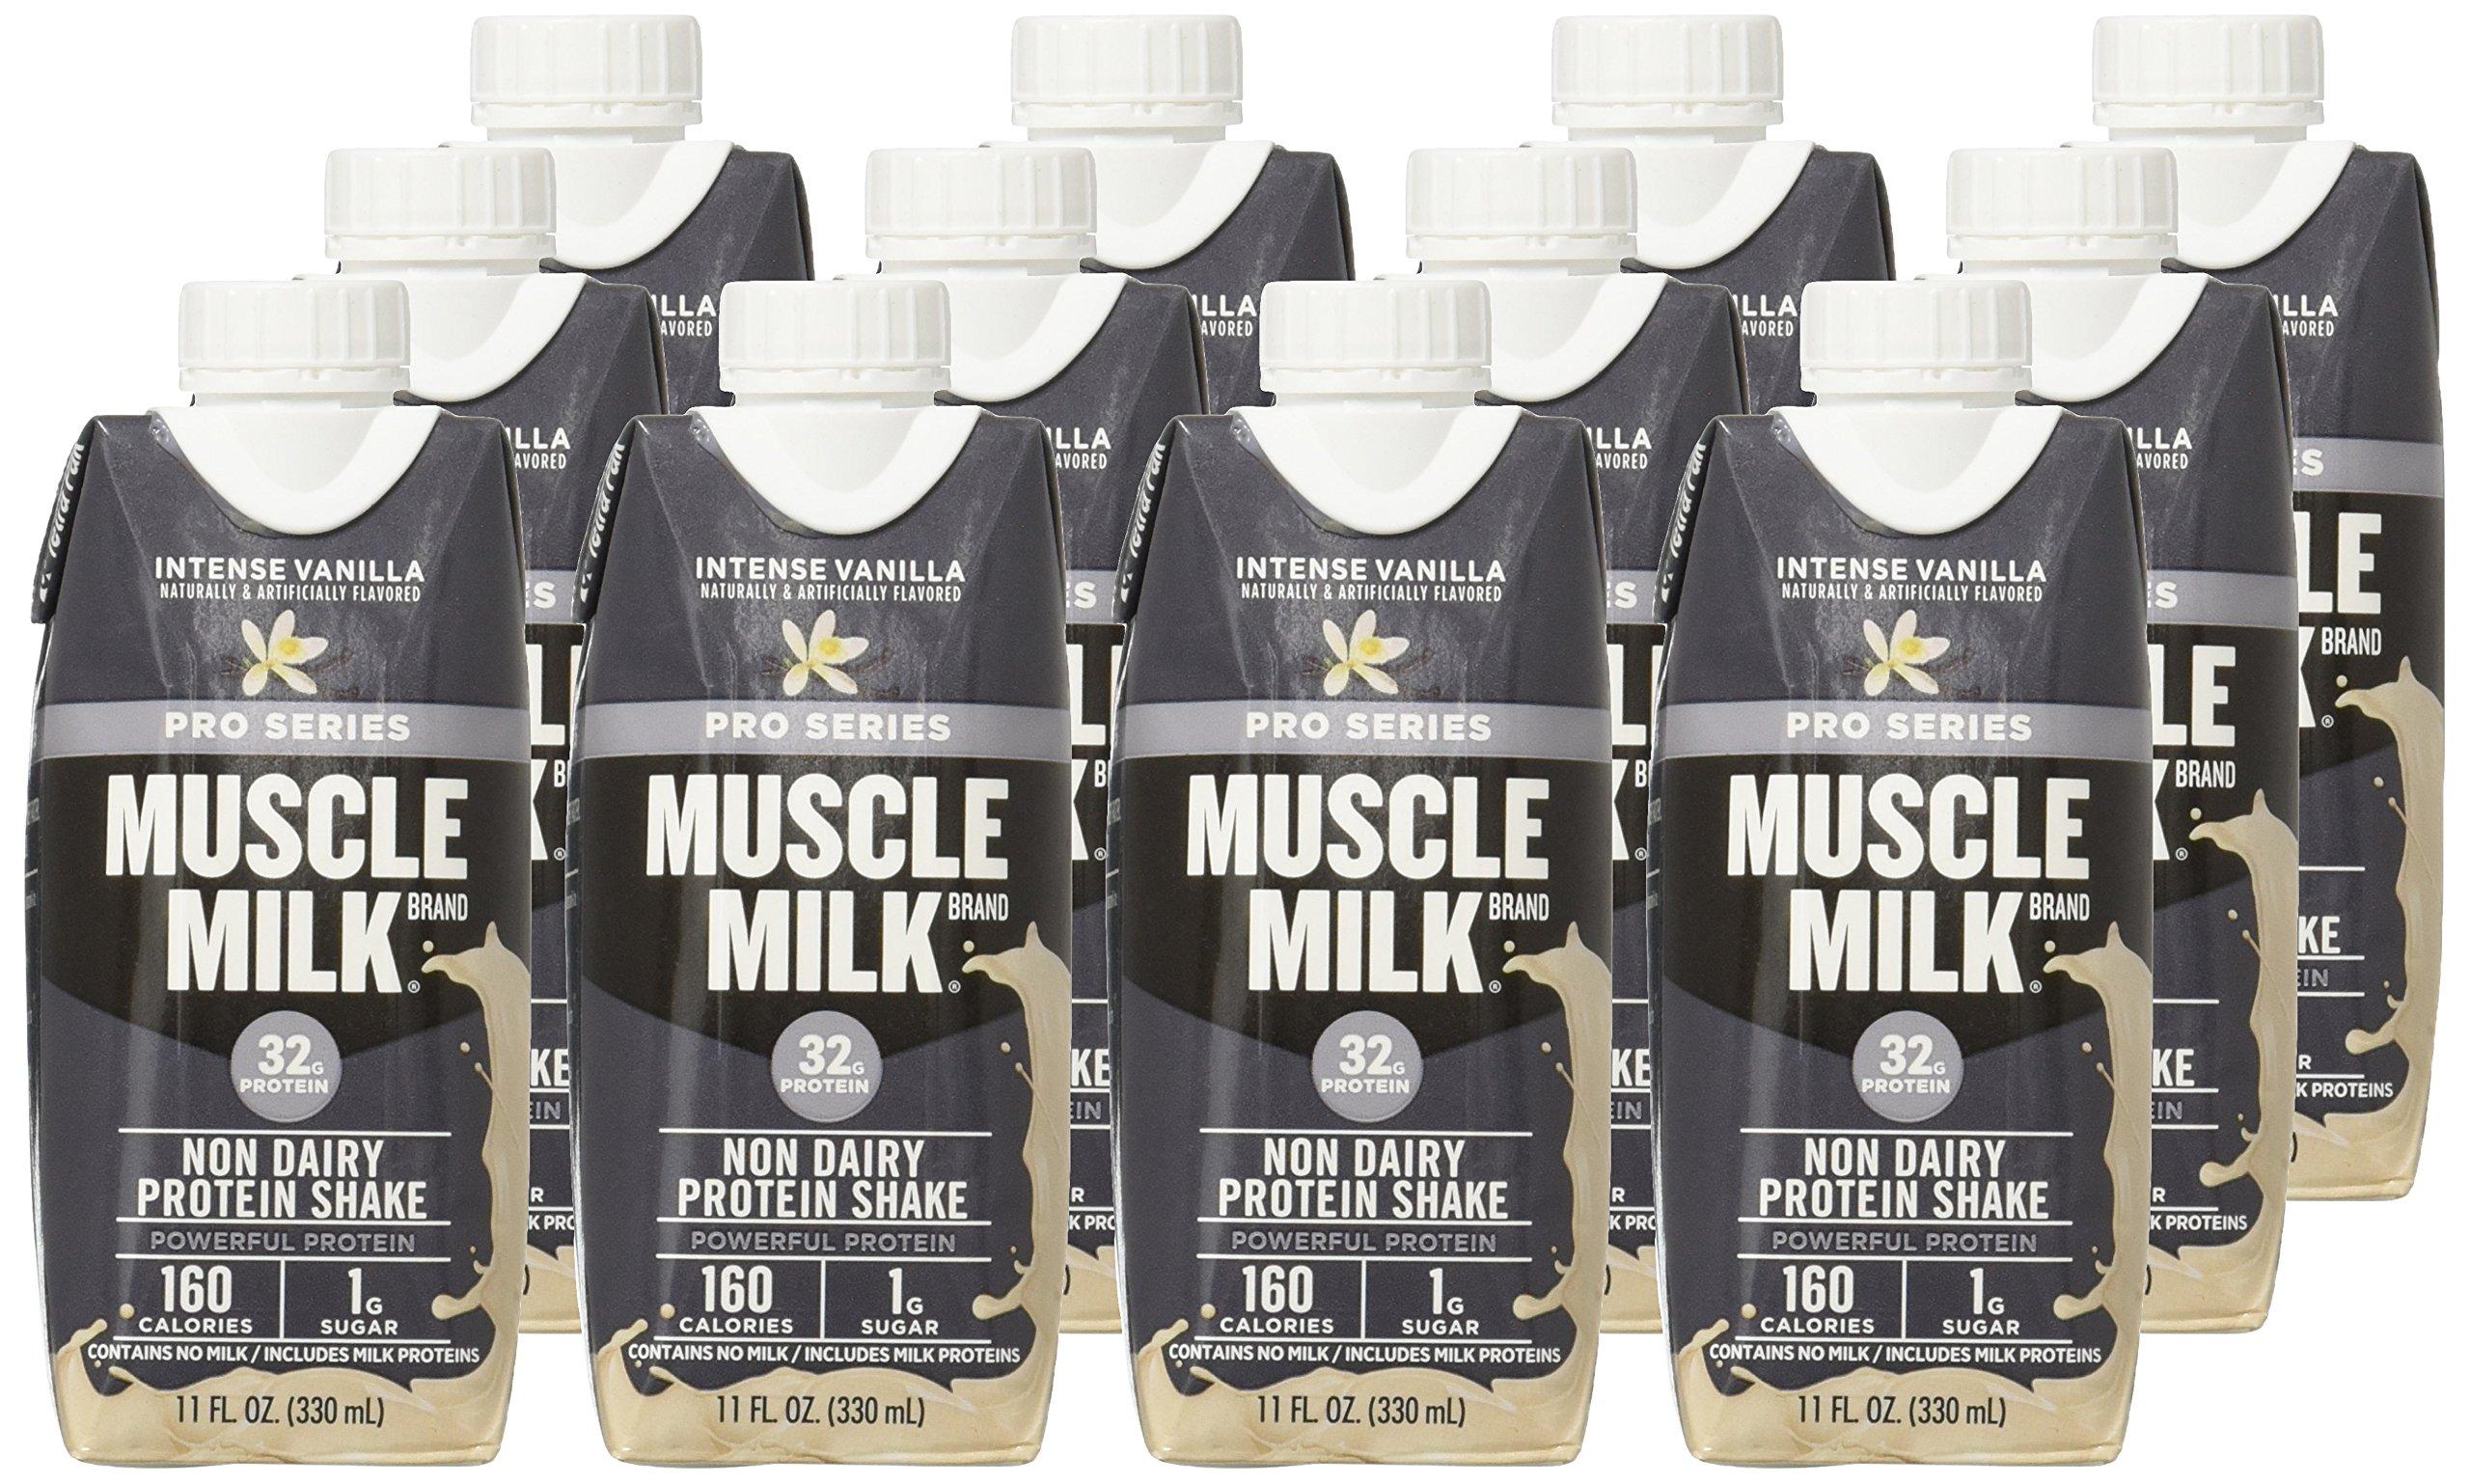 Muscle Milk Pro Series Protein Shake